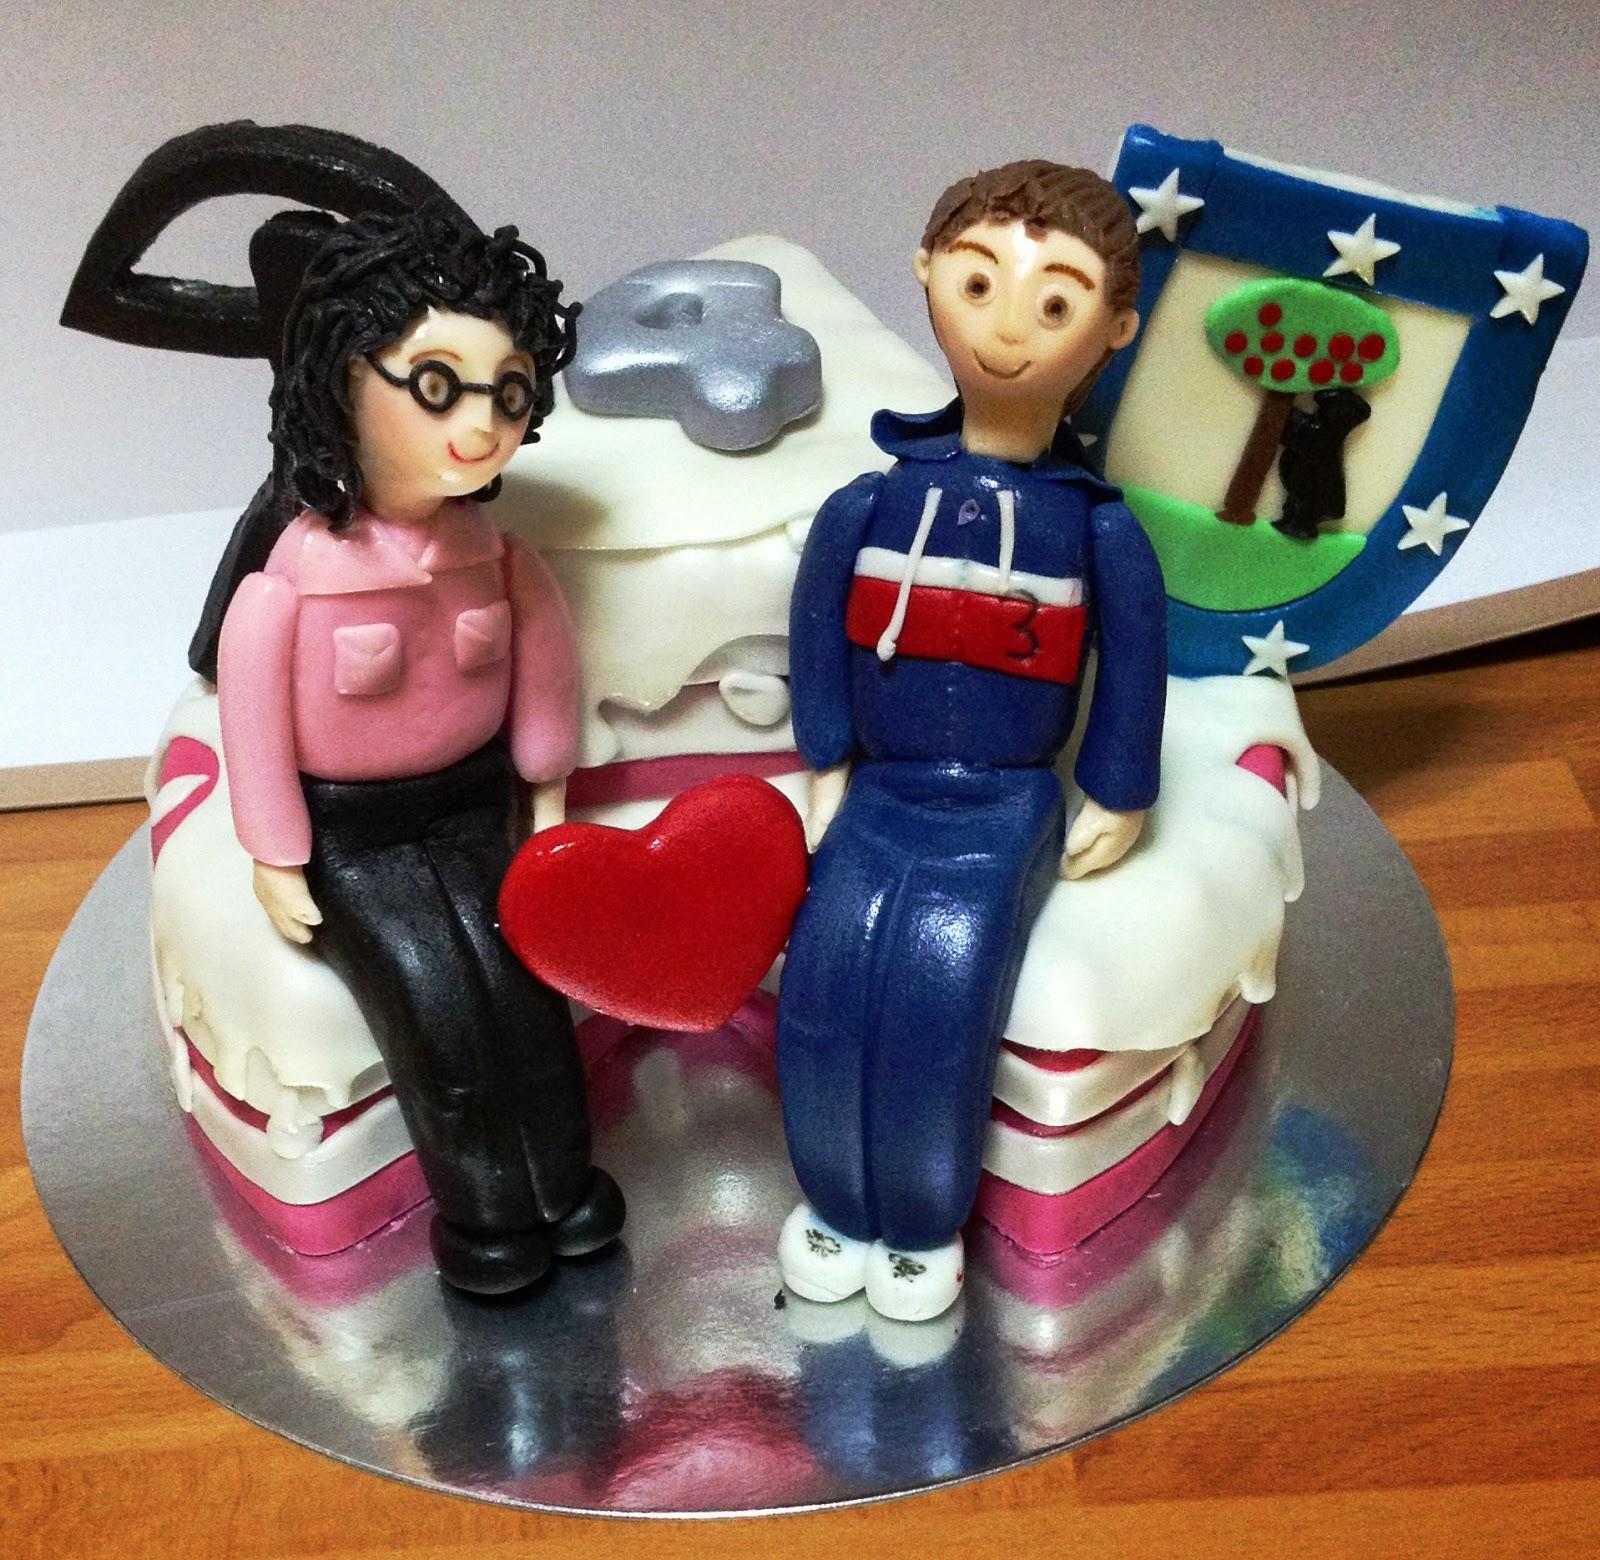 tarta aniversario. tarta decorada aniversario; tarta fondant aniversario